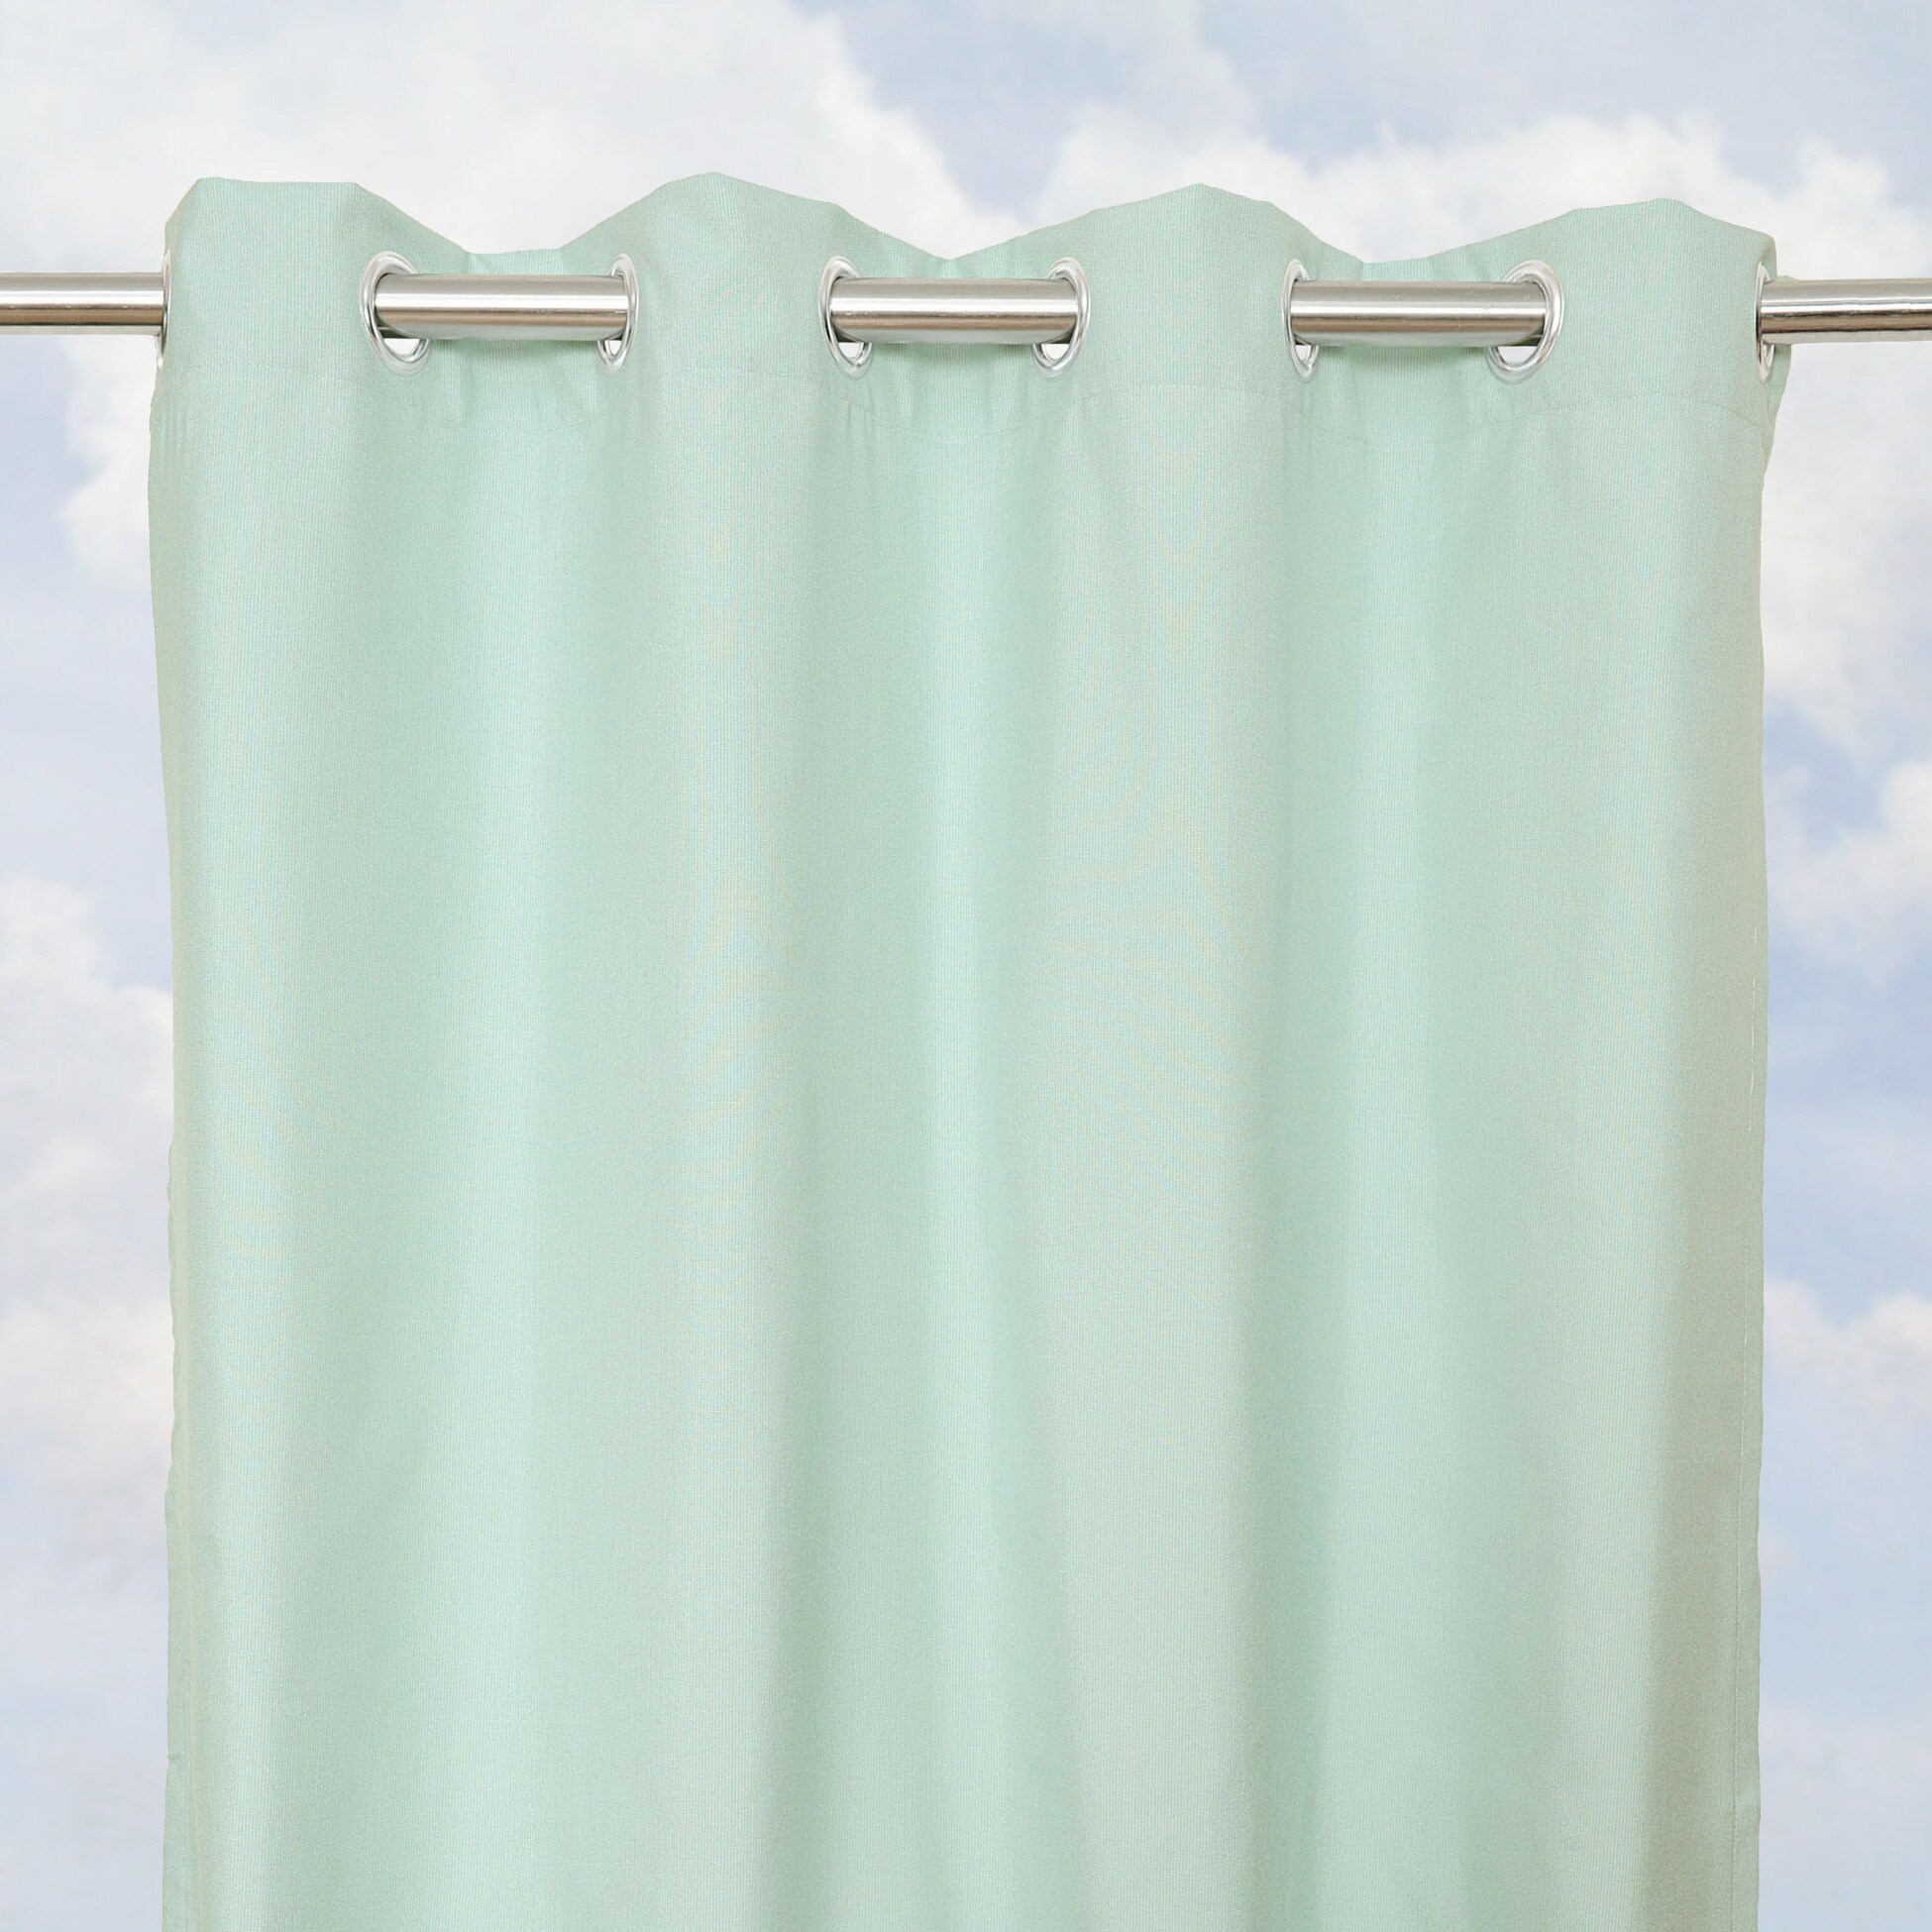 Sunbrella Bay View Mist 84-inch Outdoor Curtain Panel